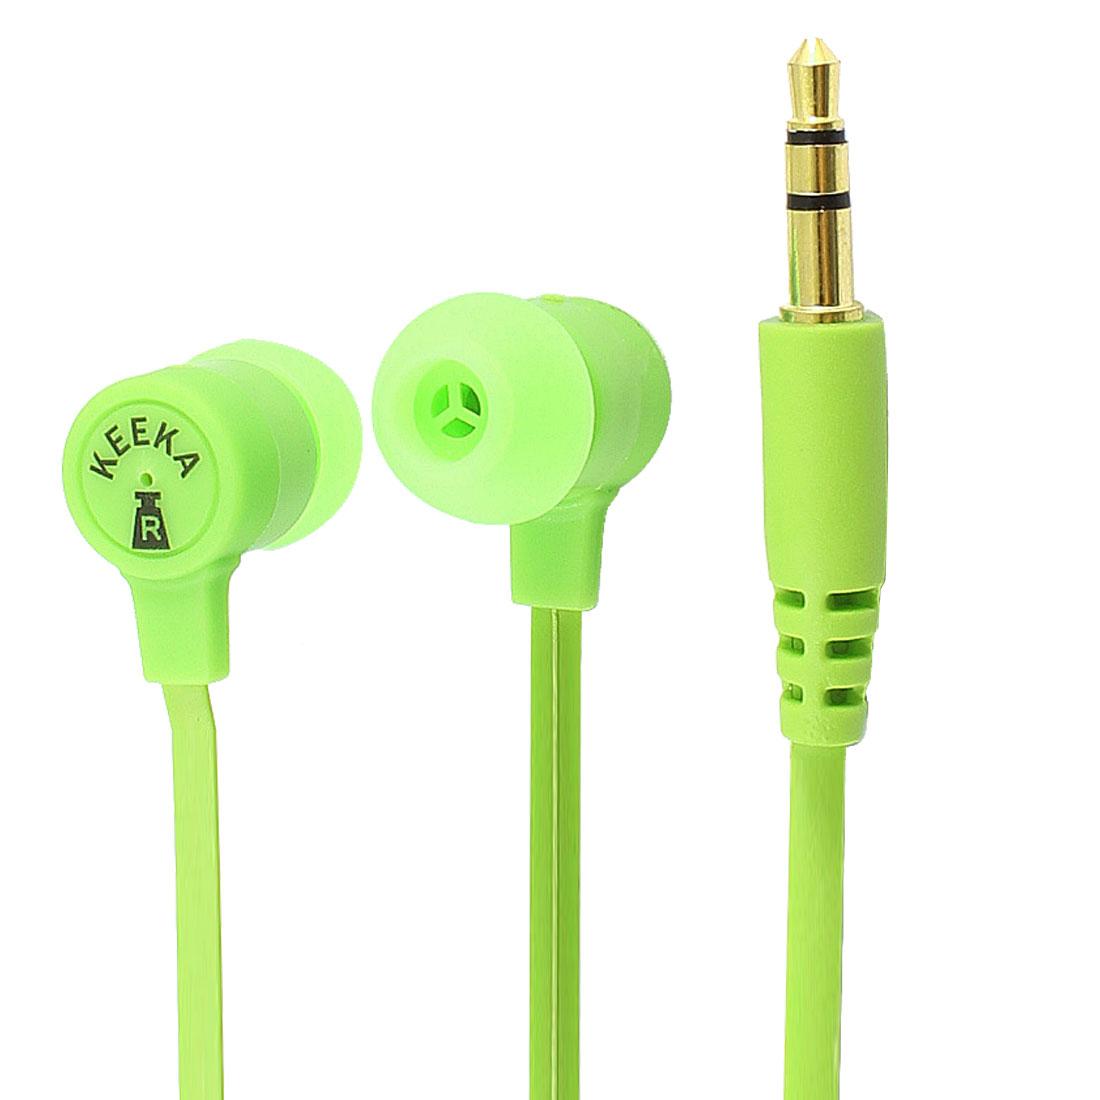 Authorized KEEKA 3.5mm Plug Green In Ear Stereo Headphone for Phone